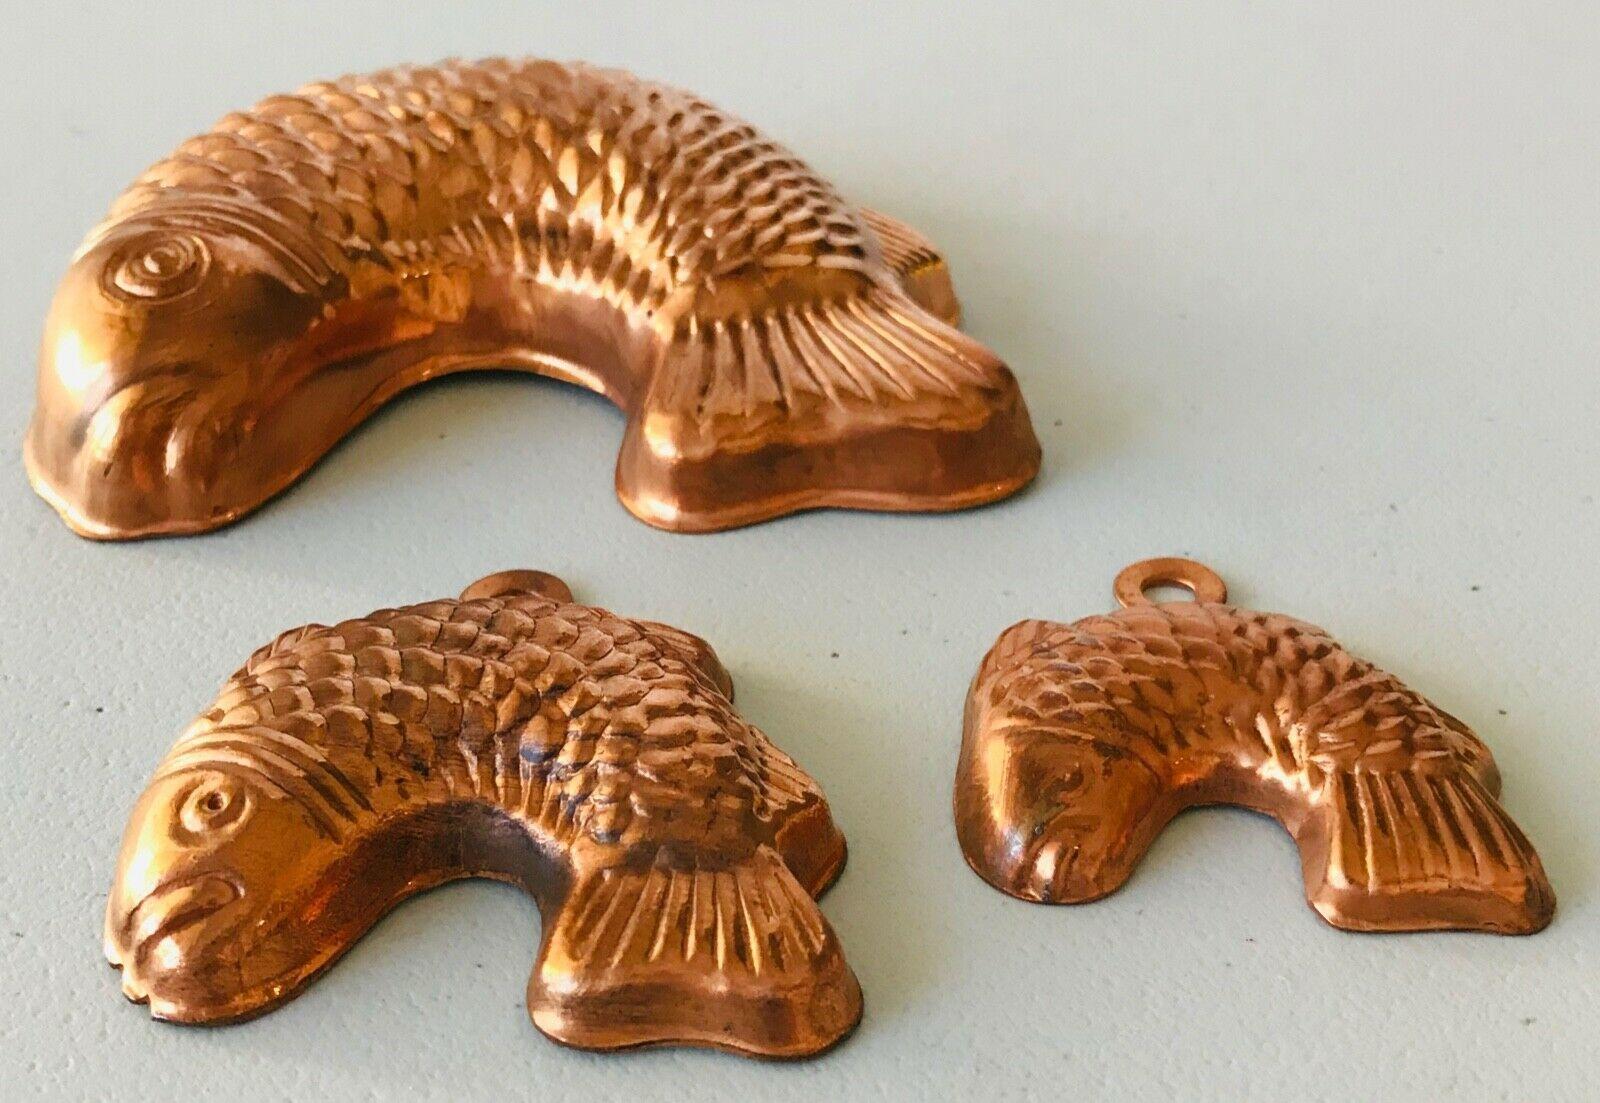 3 Mini Copper Tin Fish Molds Chocolate Dollhouse Kitchen Decor Ornaments